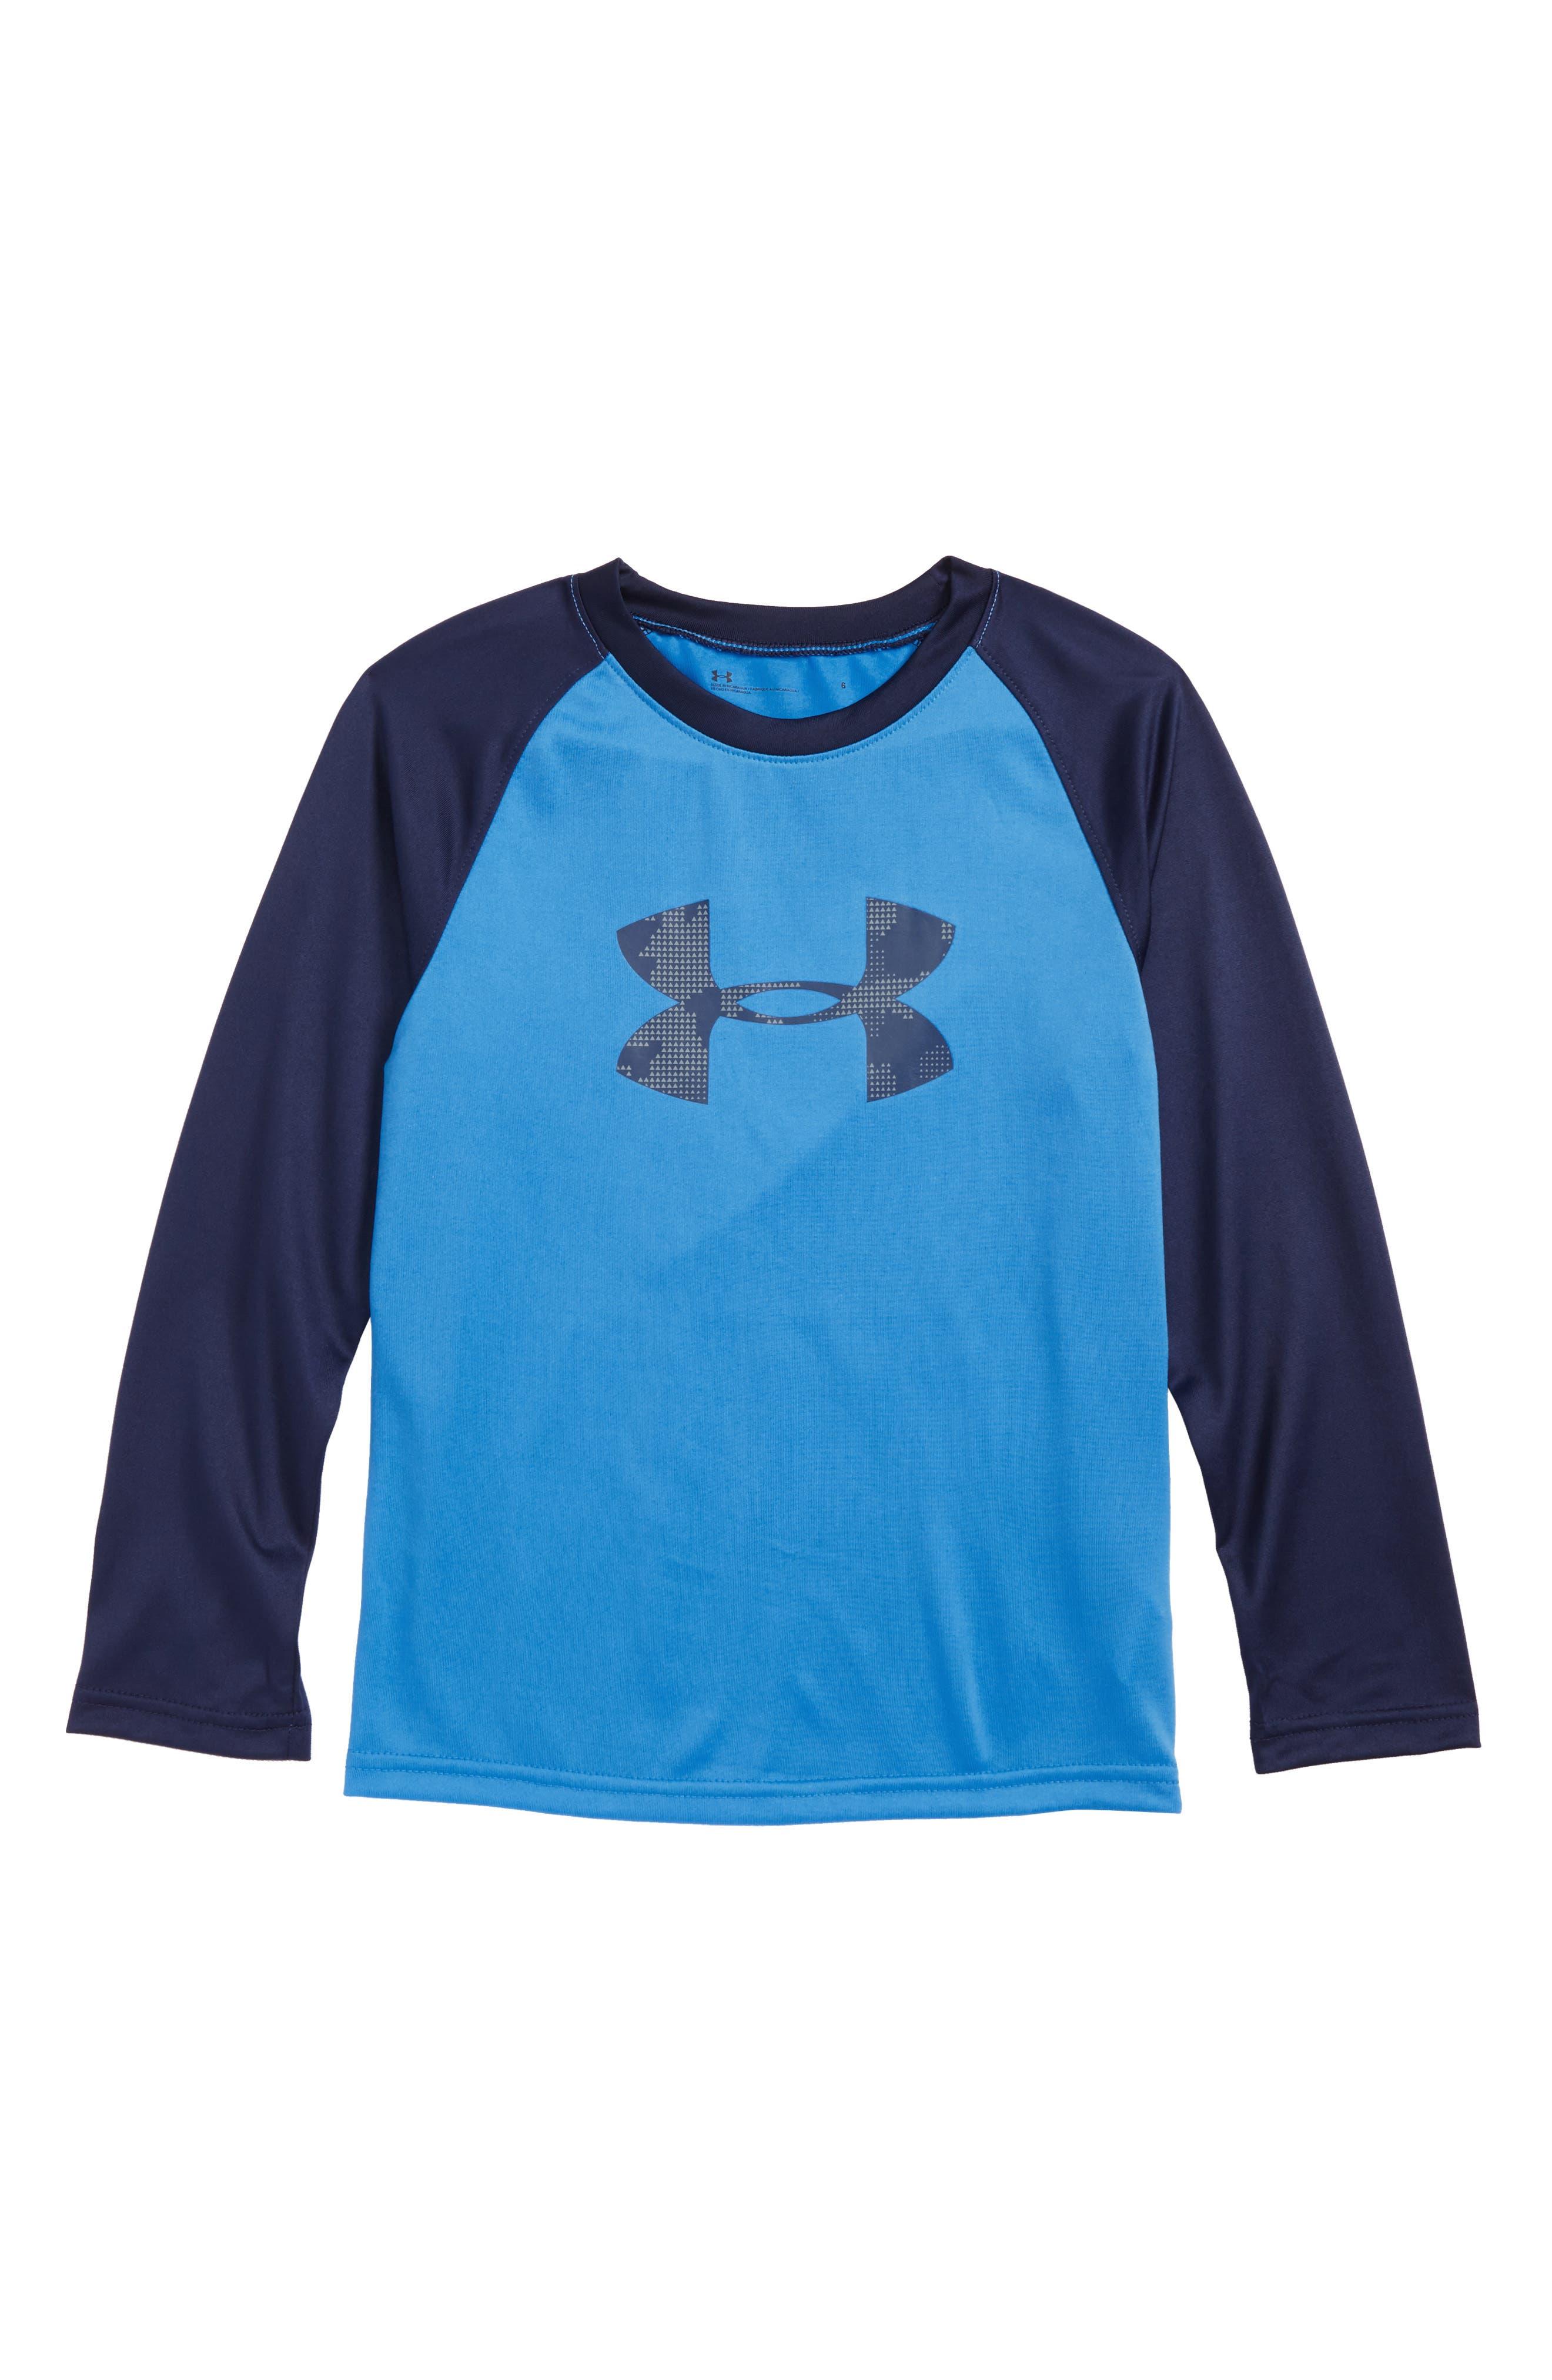 Main Image - Under Armour Camo Big Logo HeatGear® T-Shirt (Toddler Boys & Little Boys)